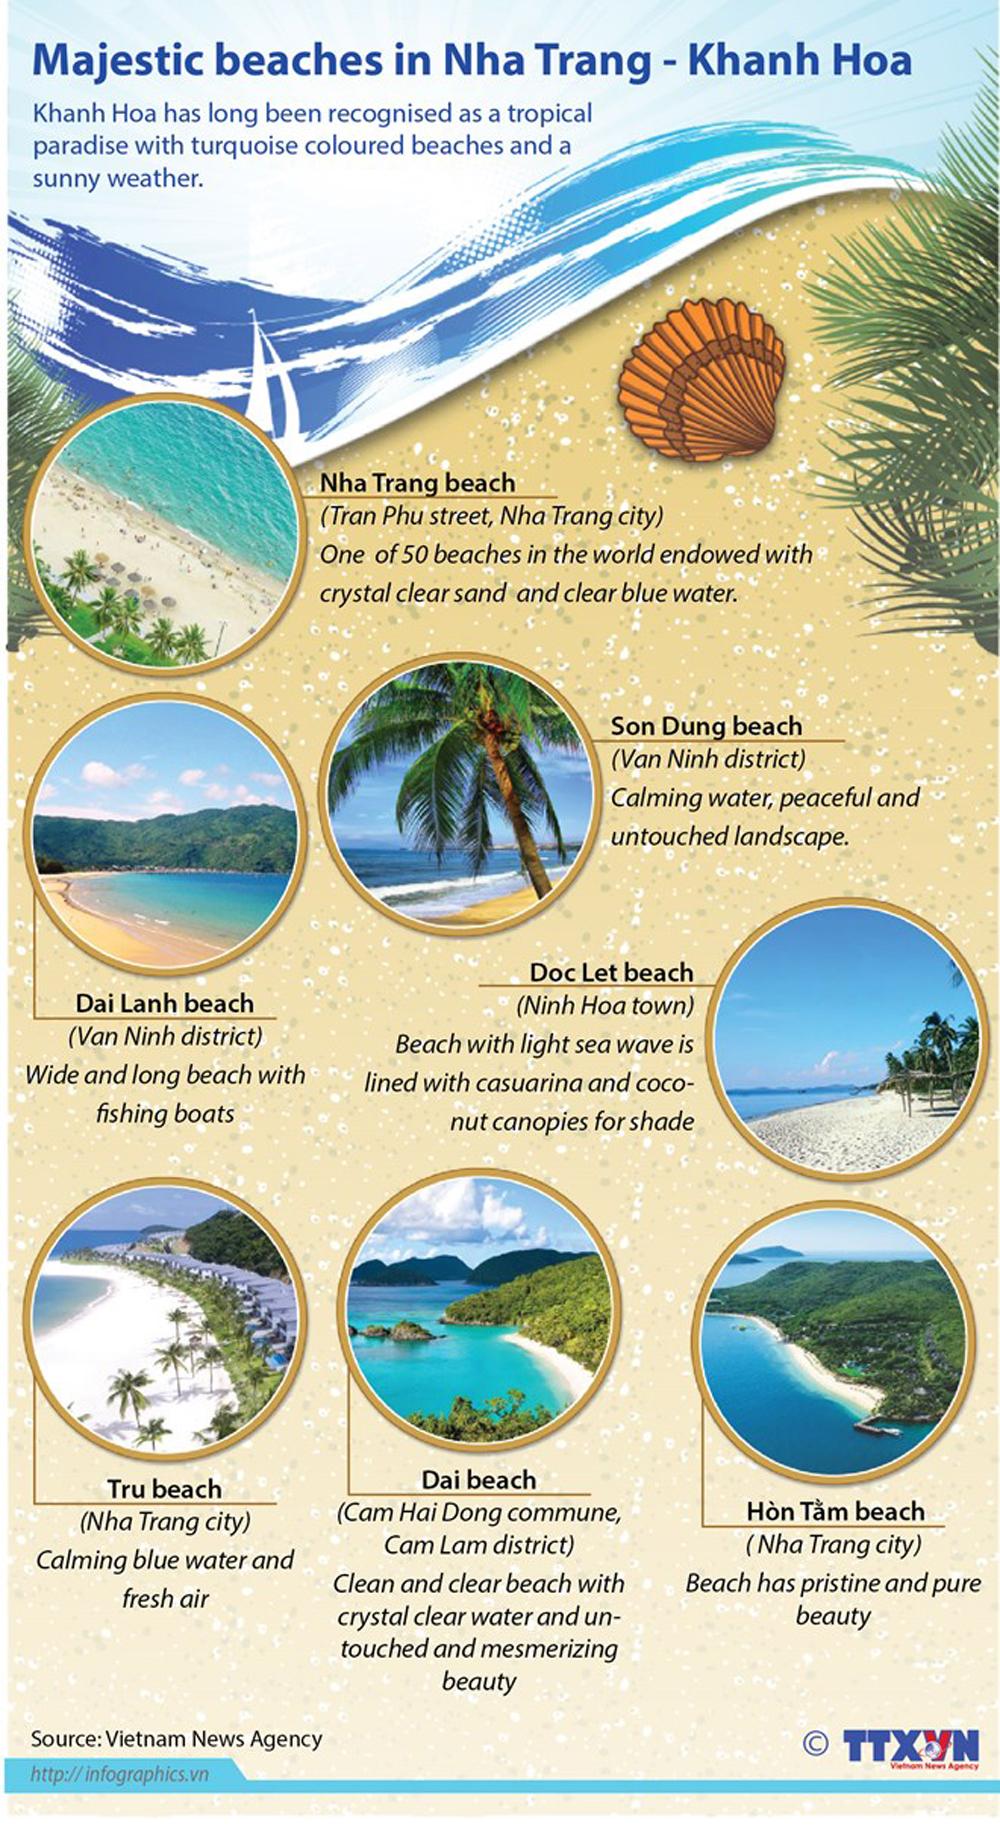 Majestic beaches, Nha Trang - Khanh Hoa, popular destination, tropical paradise